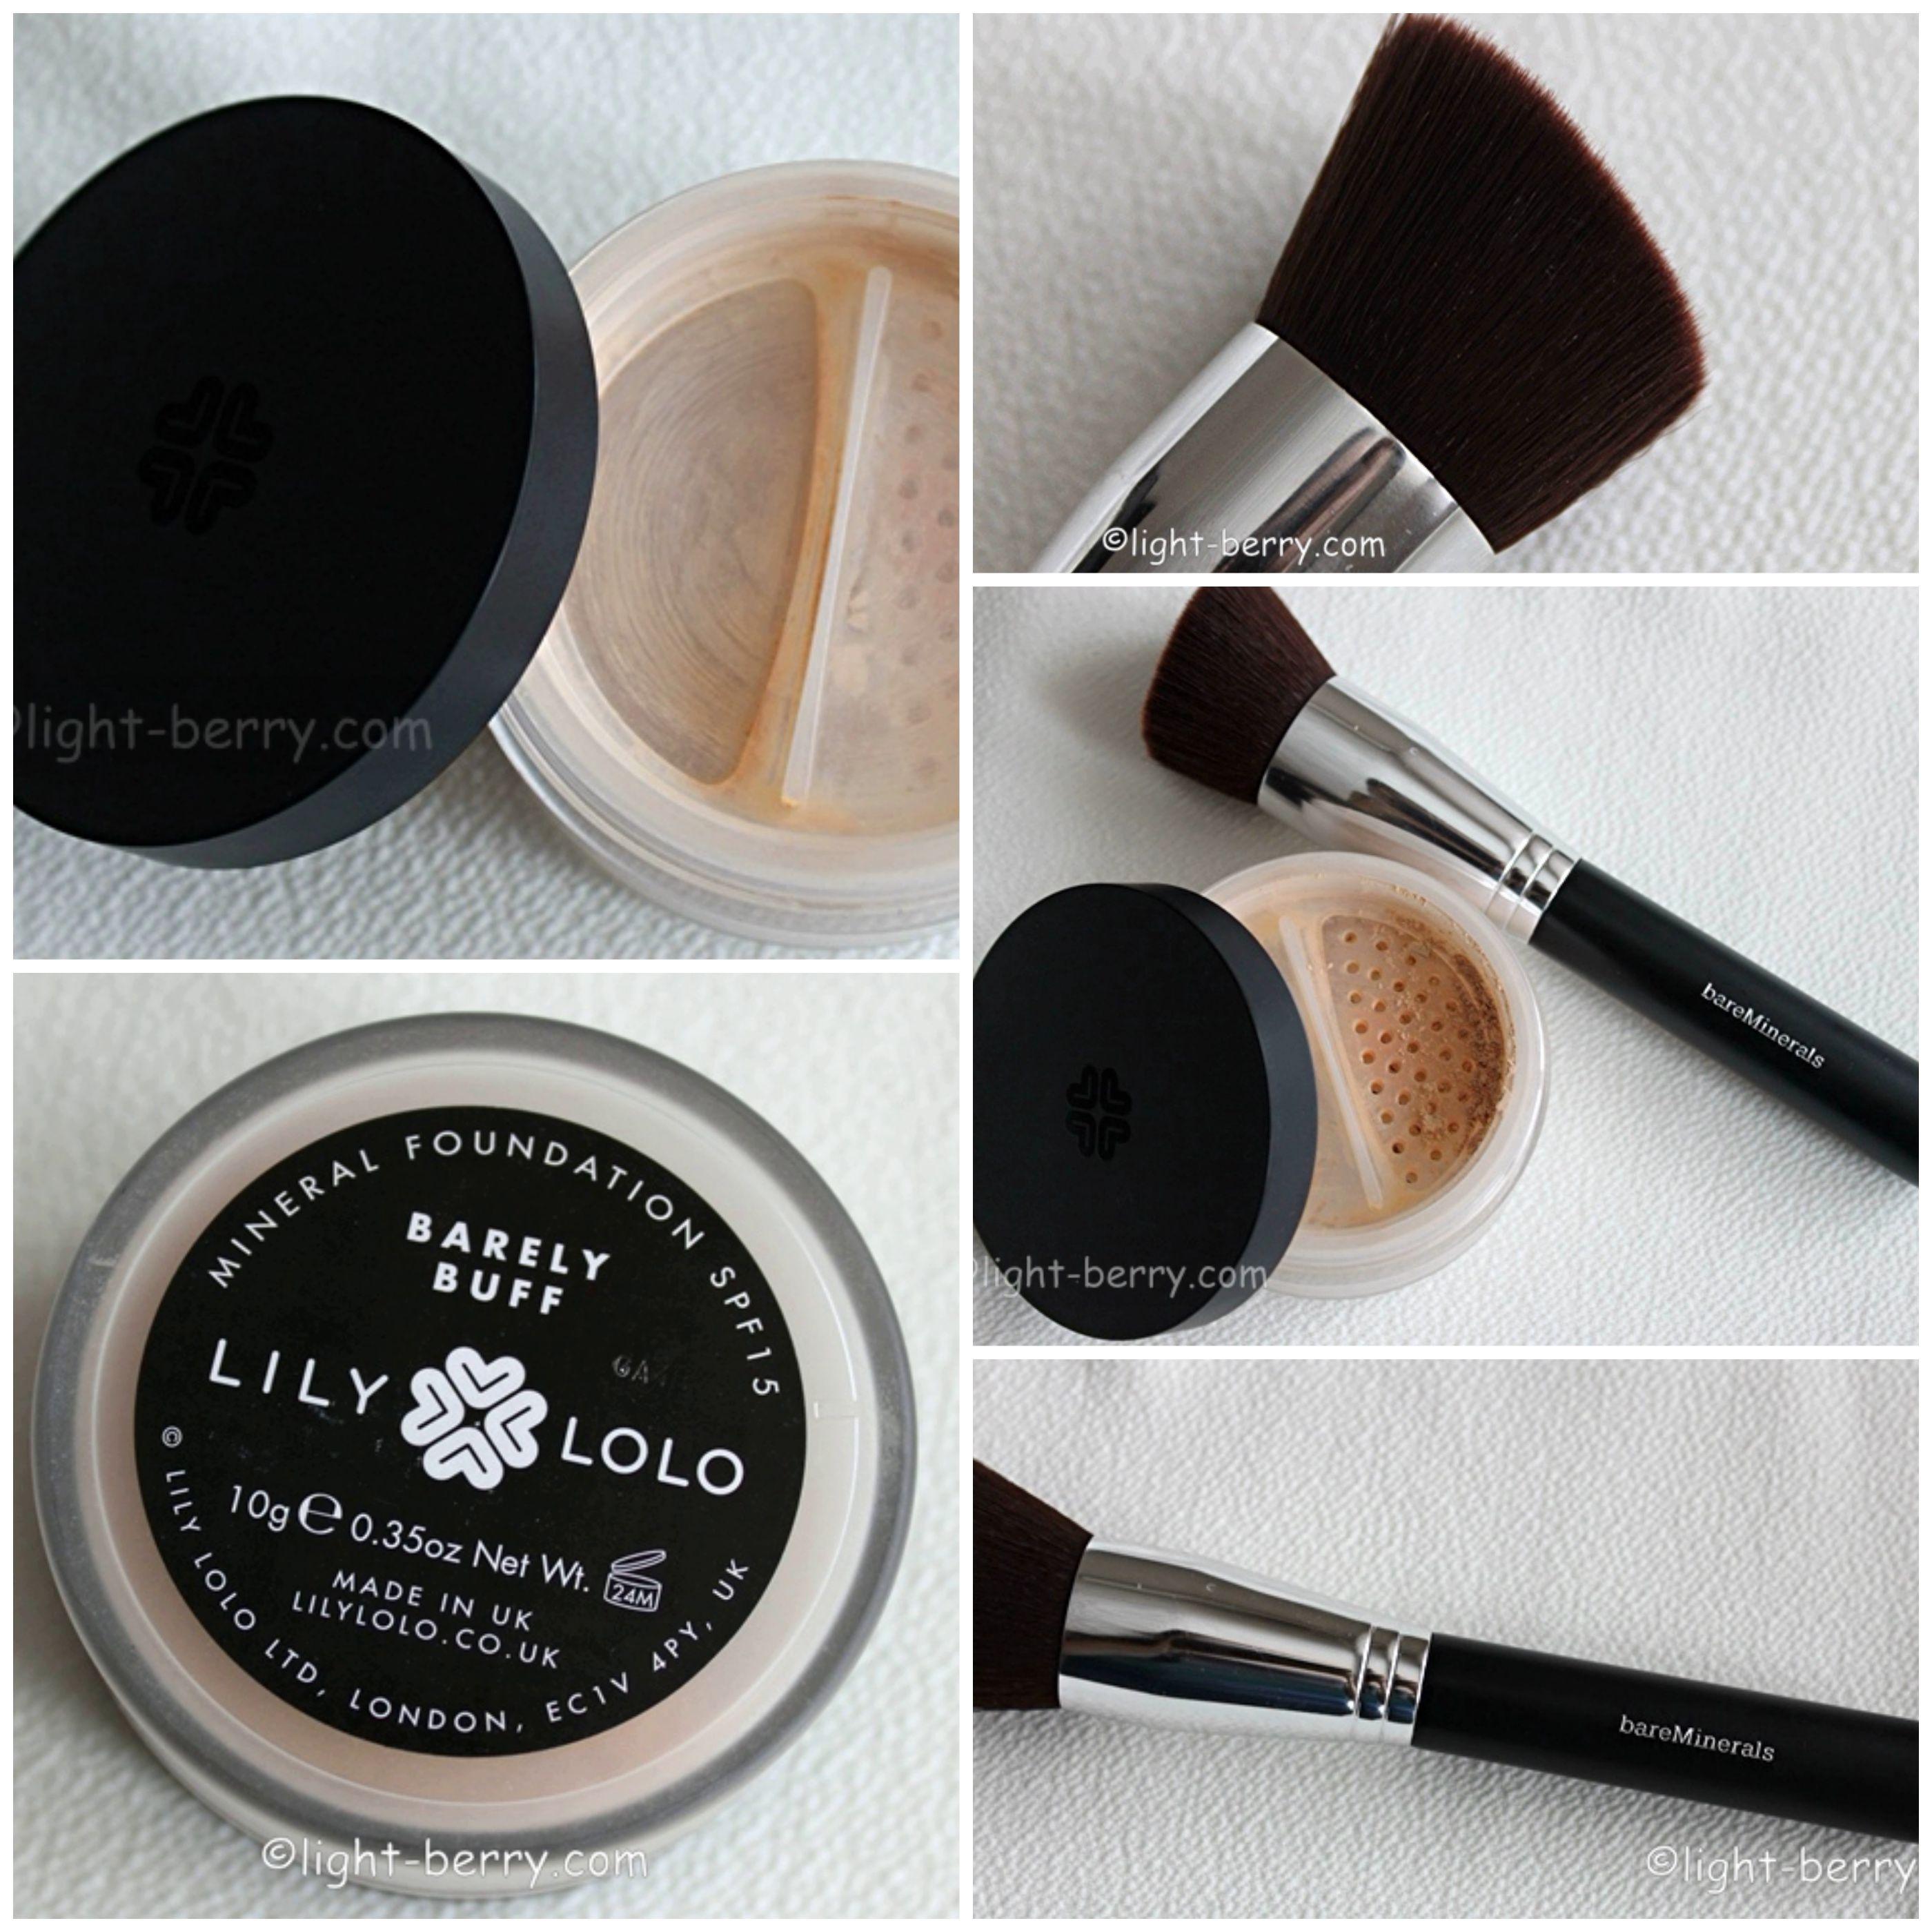 Lily Lolo Makeup Review Jenni Raincloud lilylolo